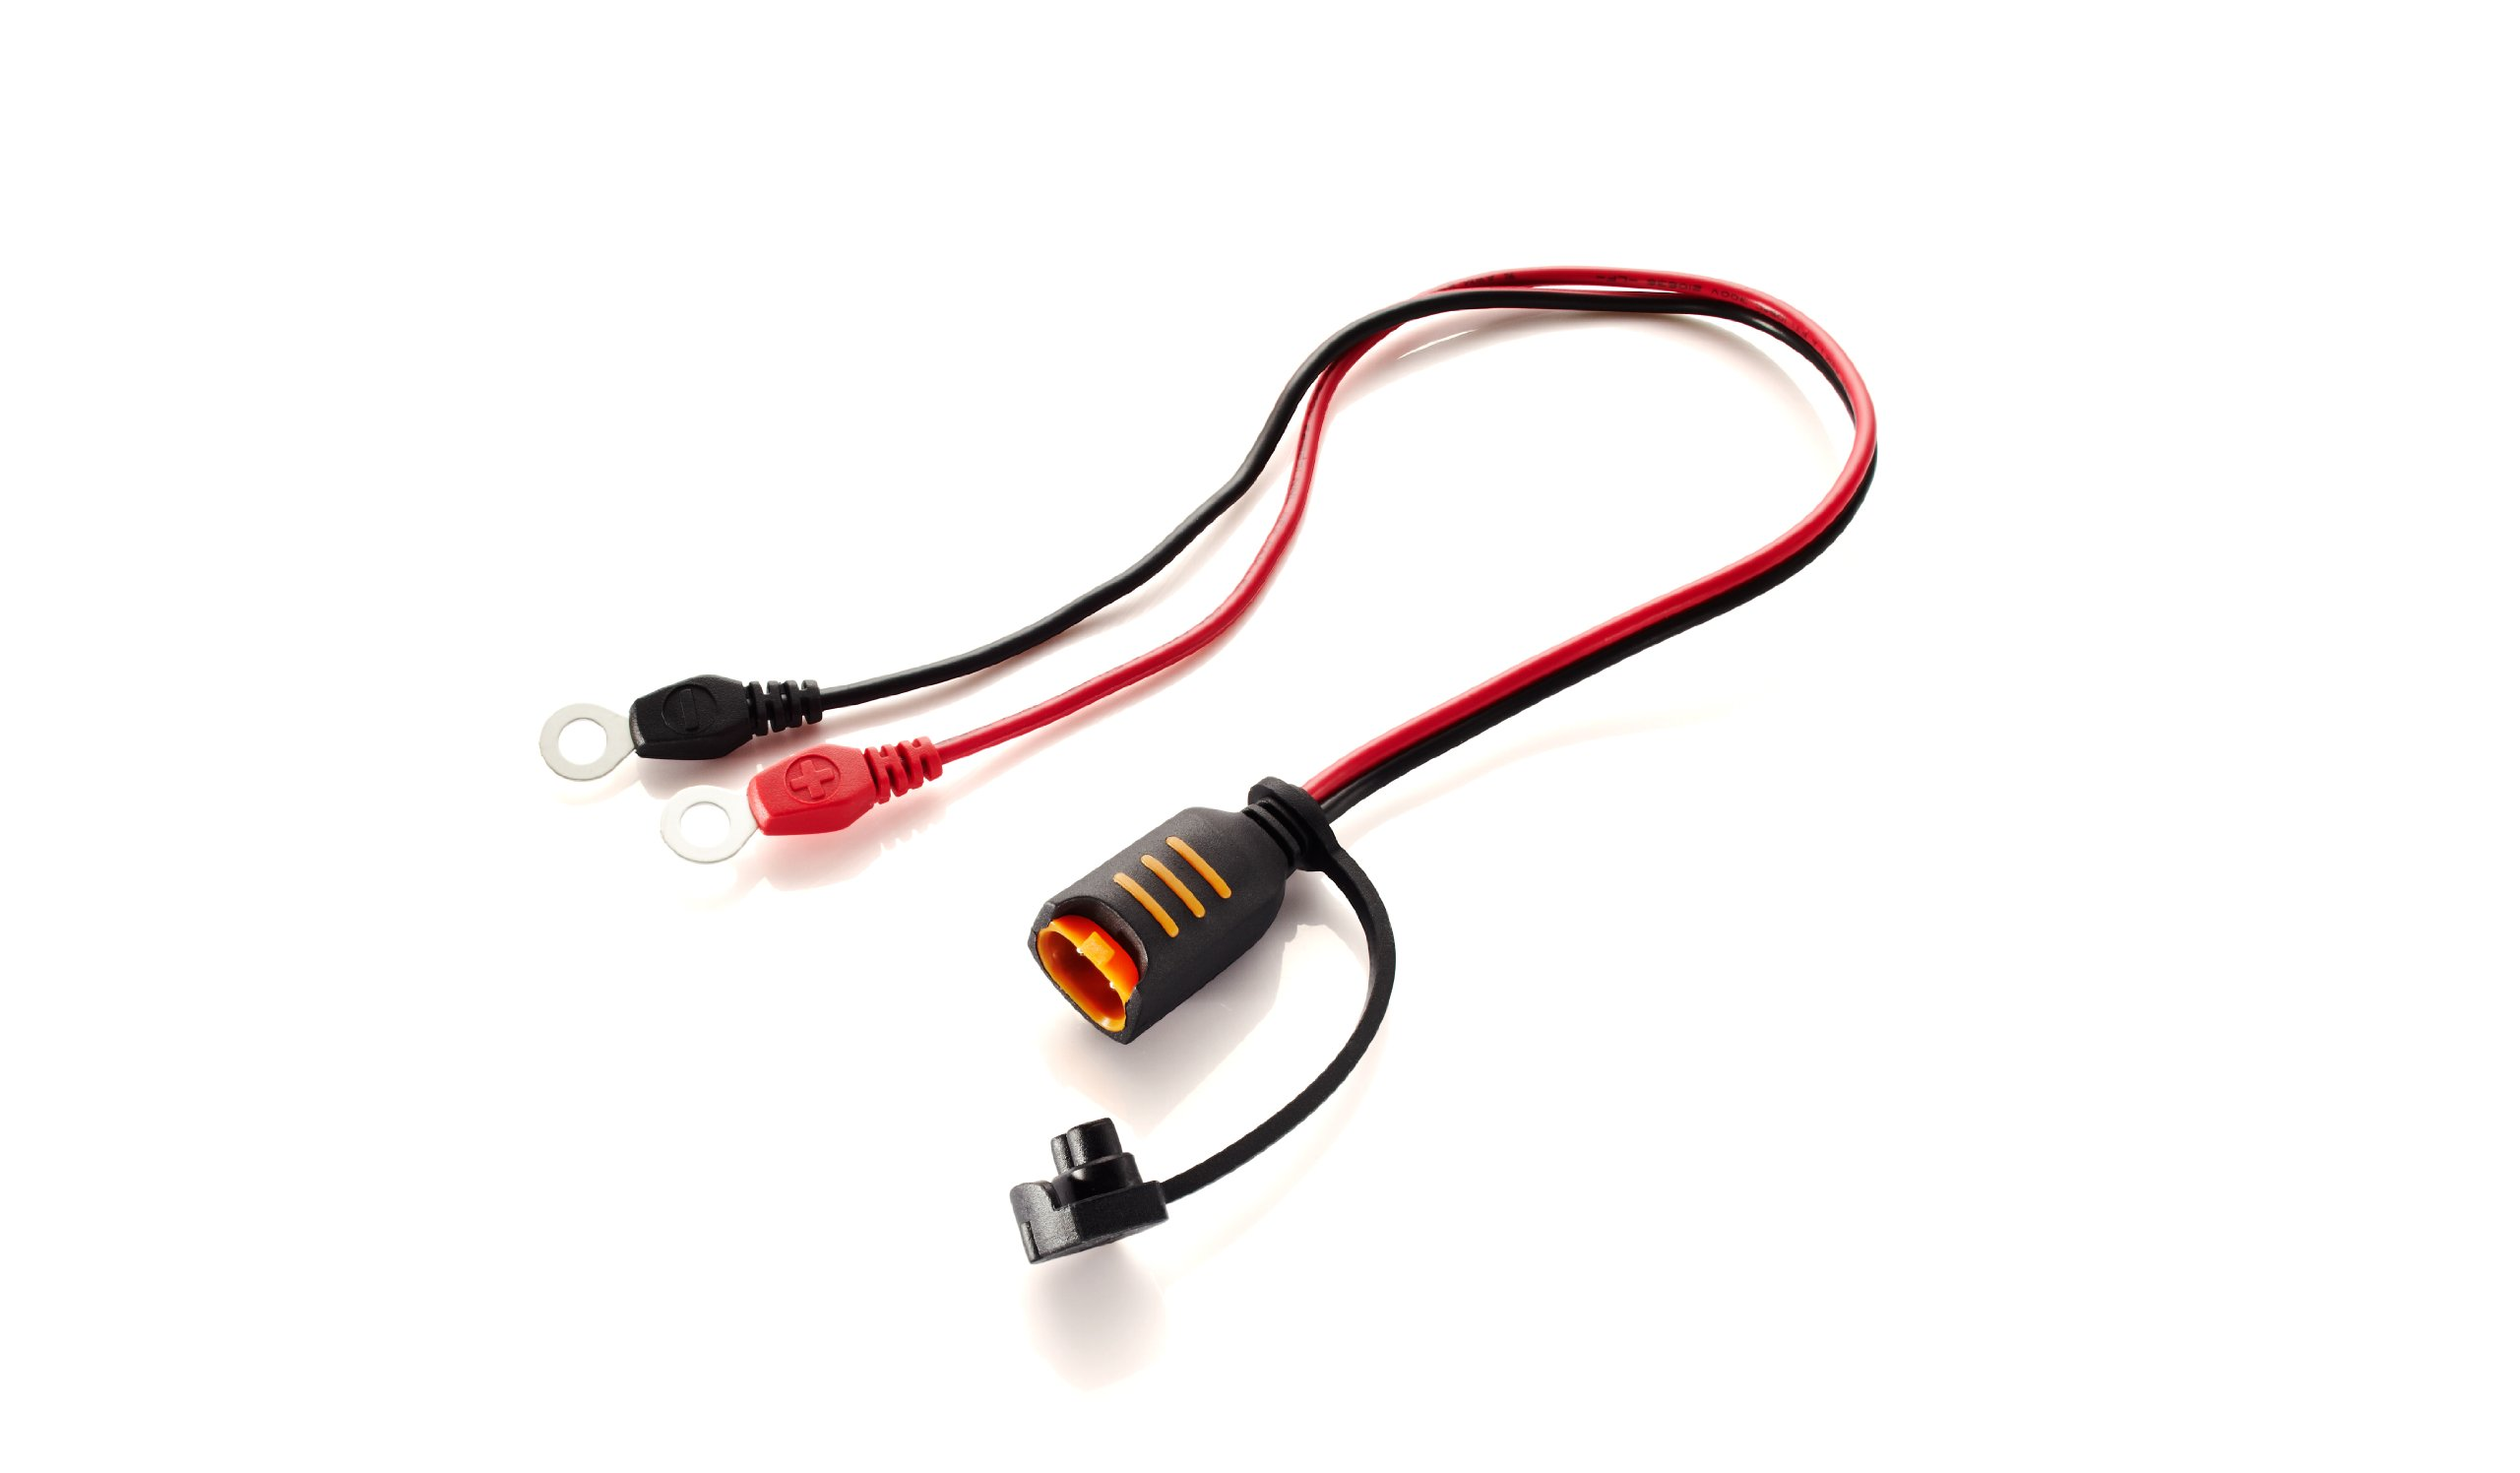 CTEK-Comfort-Connect-Direct-Connect-Adapter-M8-Muttern-Ideal-Fr-Schwer-Erreichbare-Batterien-40cm-Kabellnge